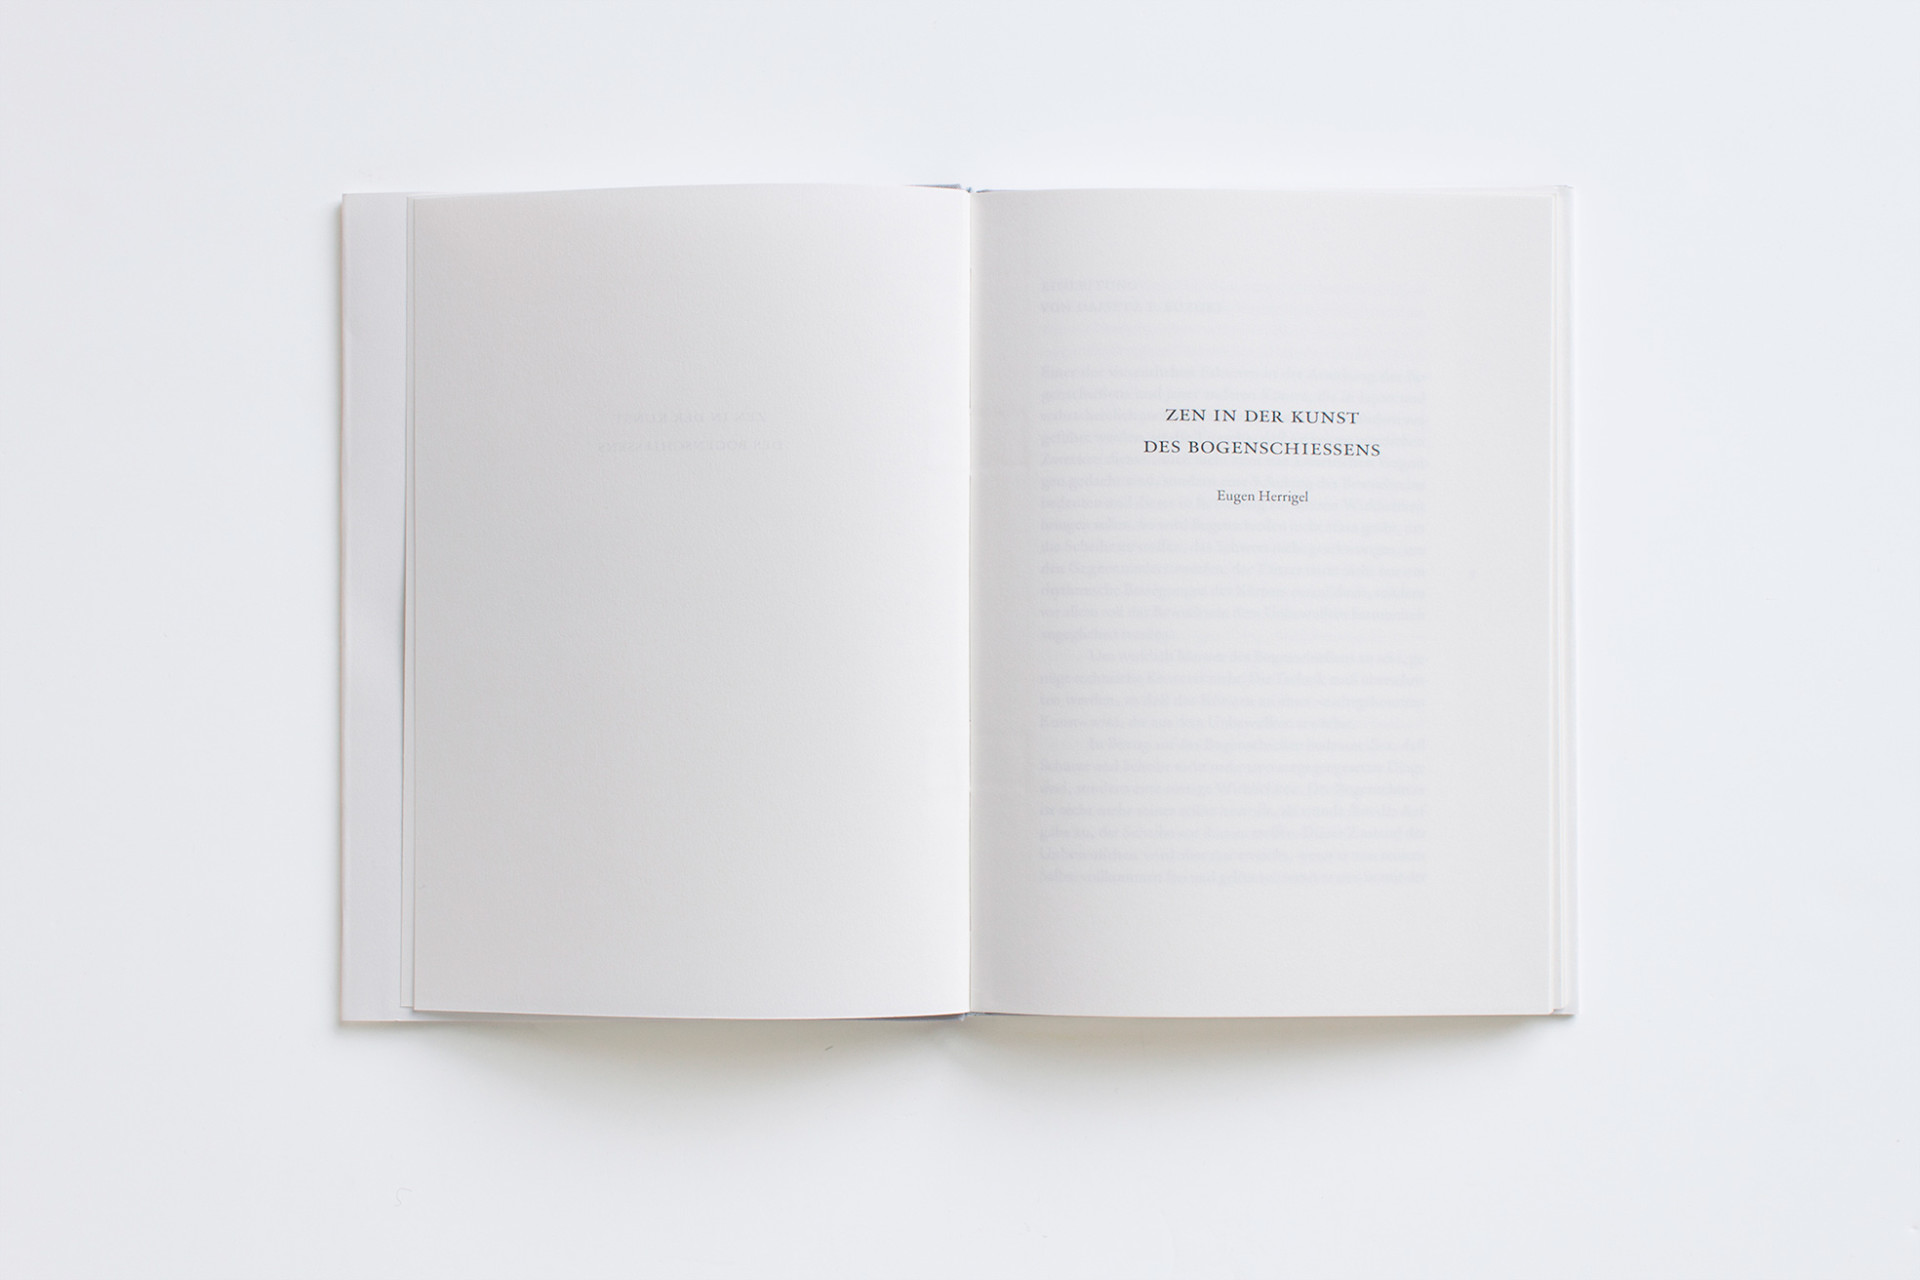 Merle Michaelis / Lettering & Typografie Yao Buchreihe